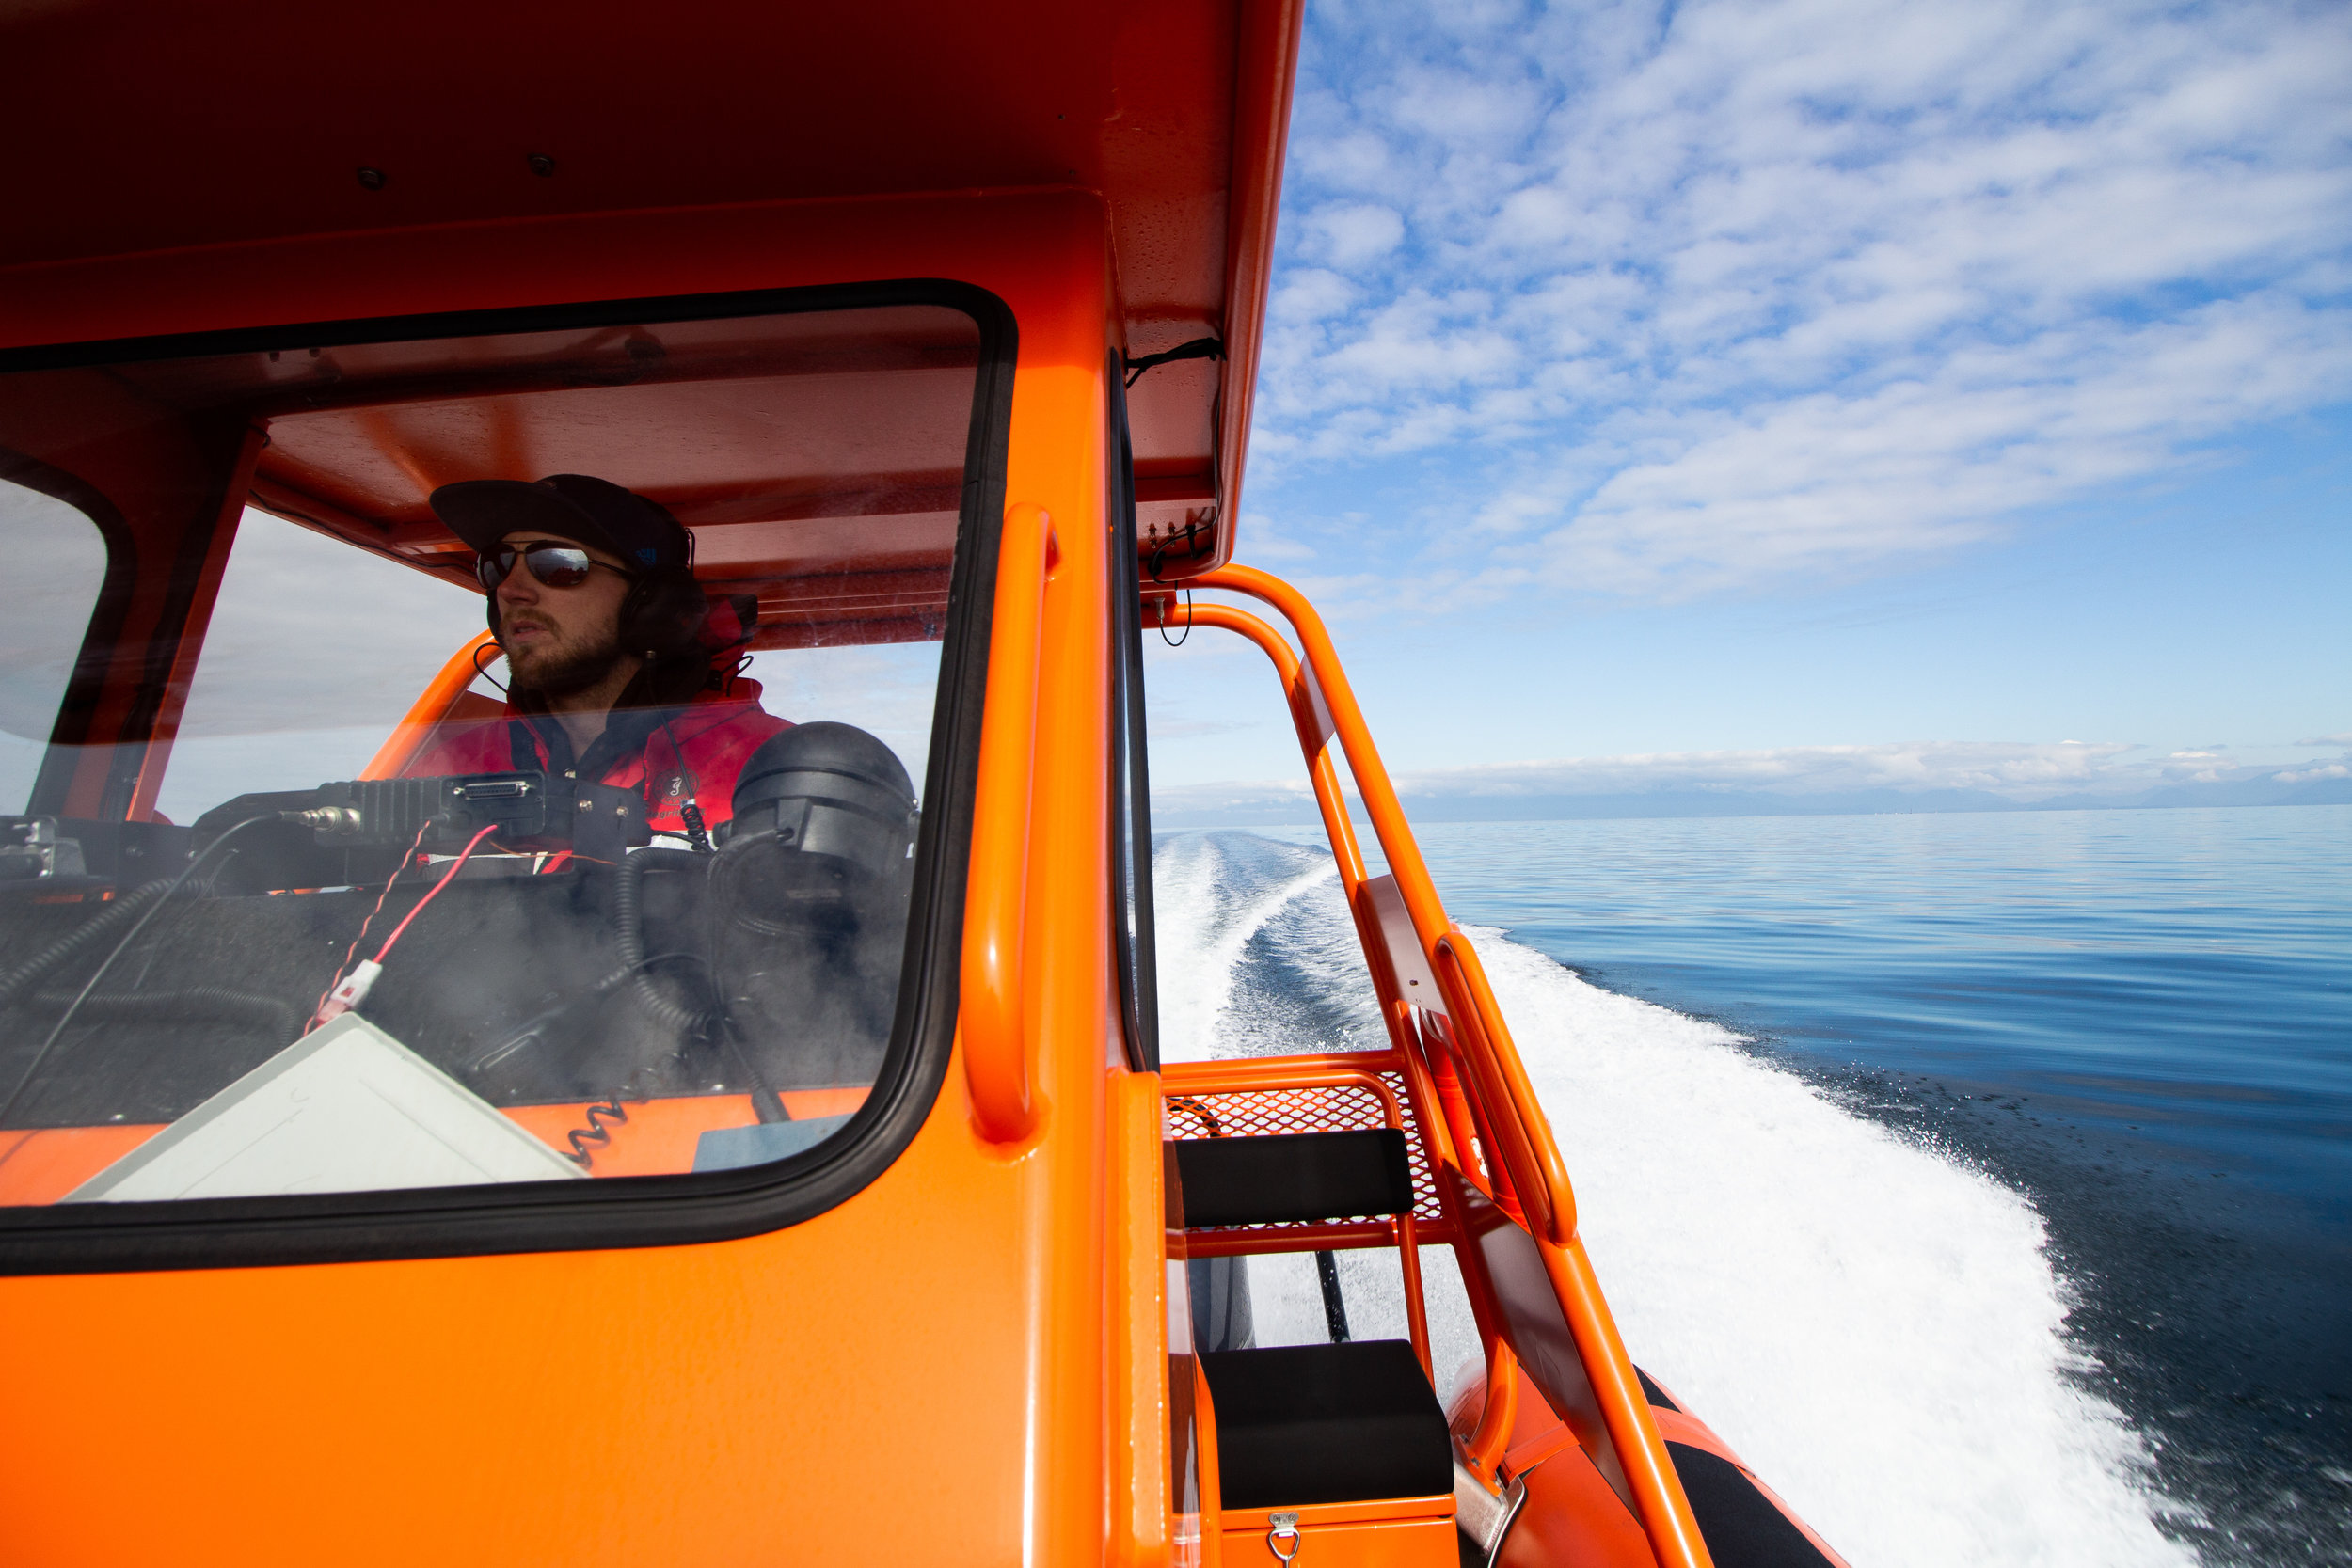 Captain James at the helm. Photo by Natalie Reichenbacher